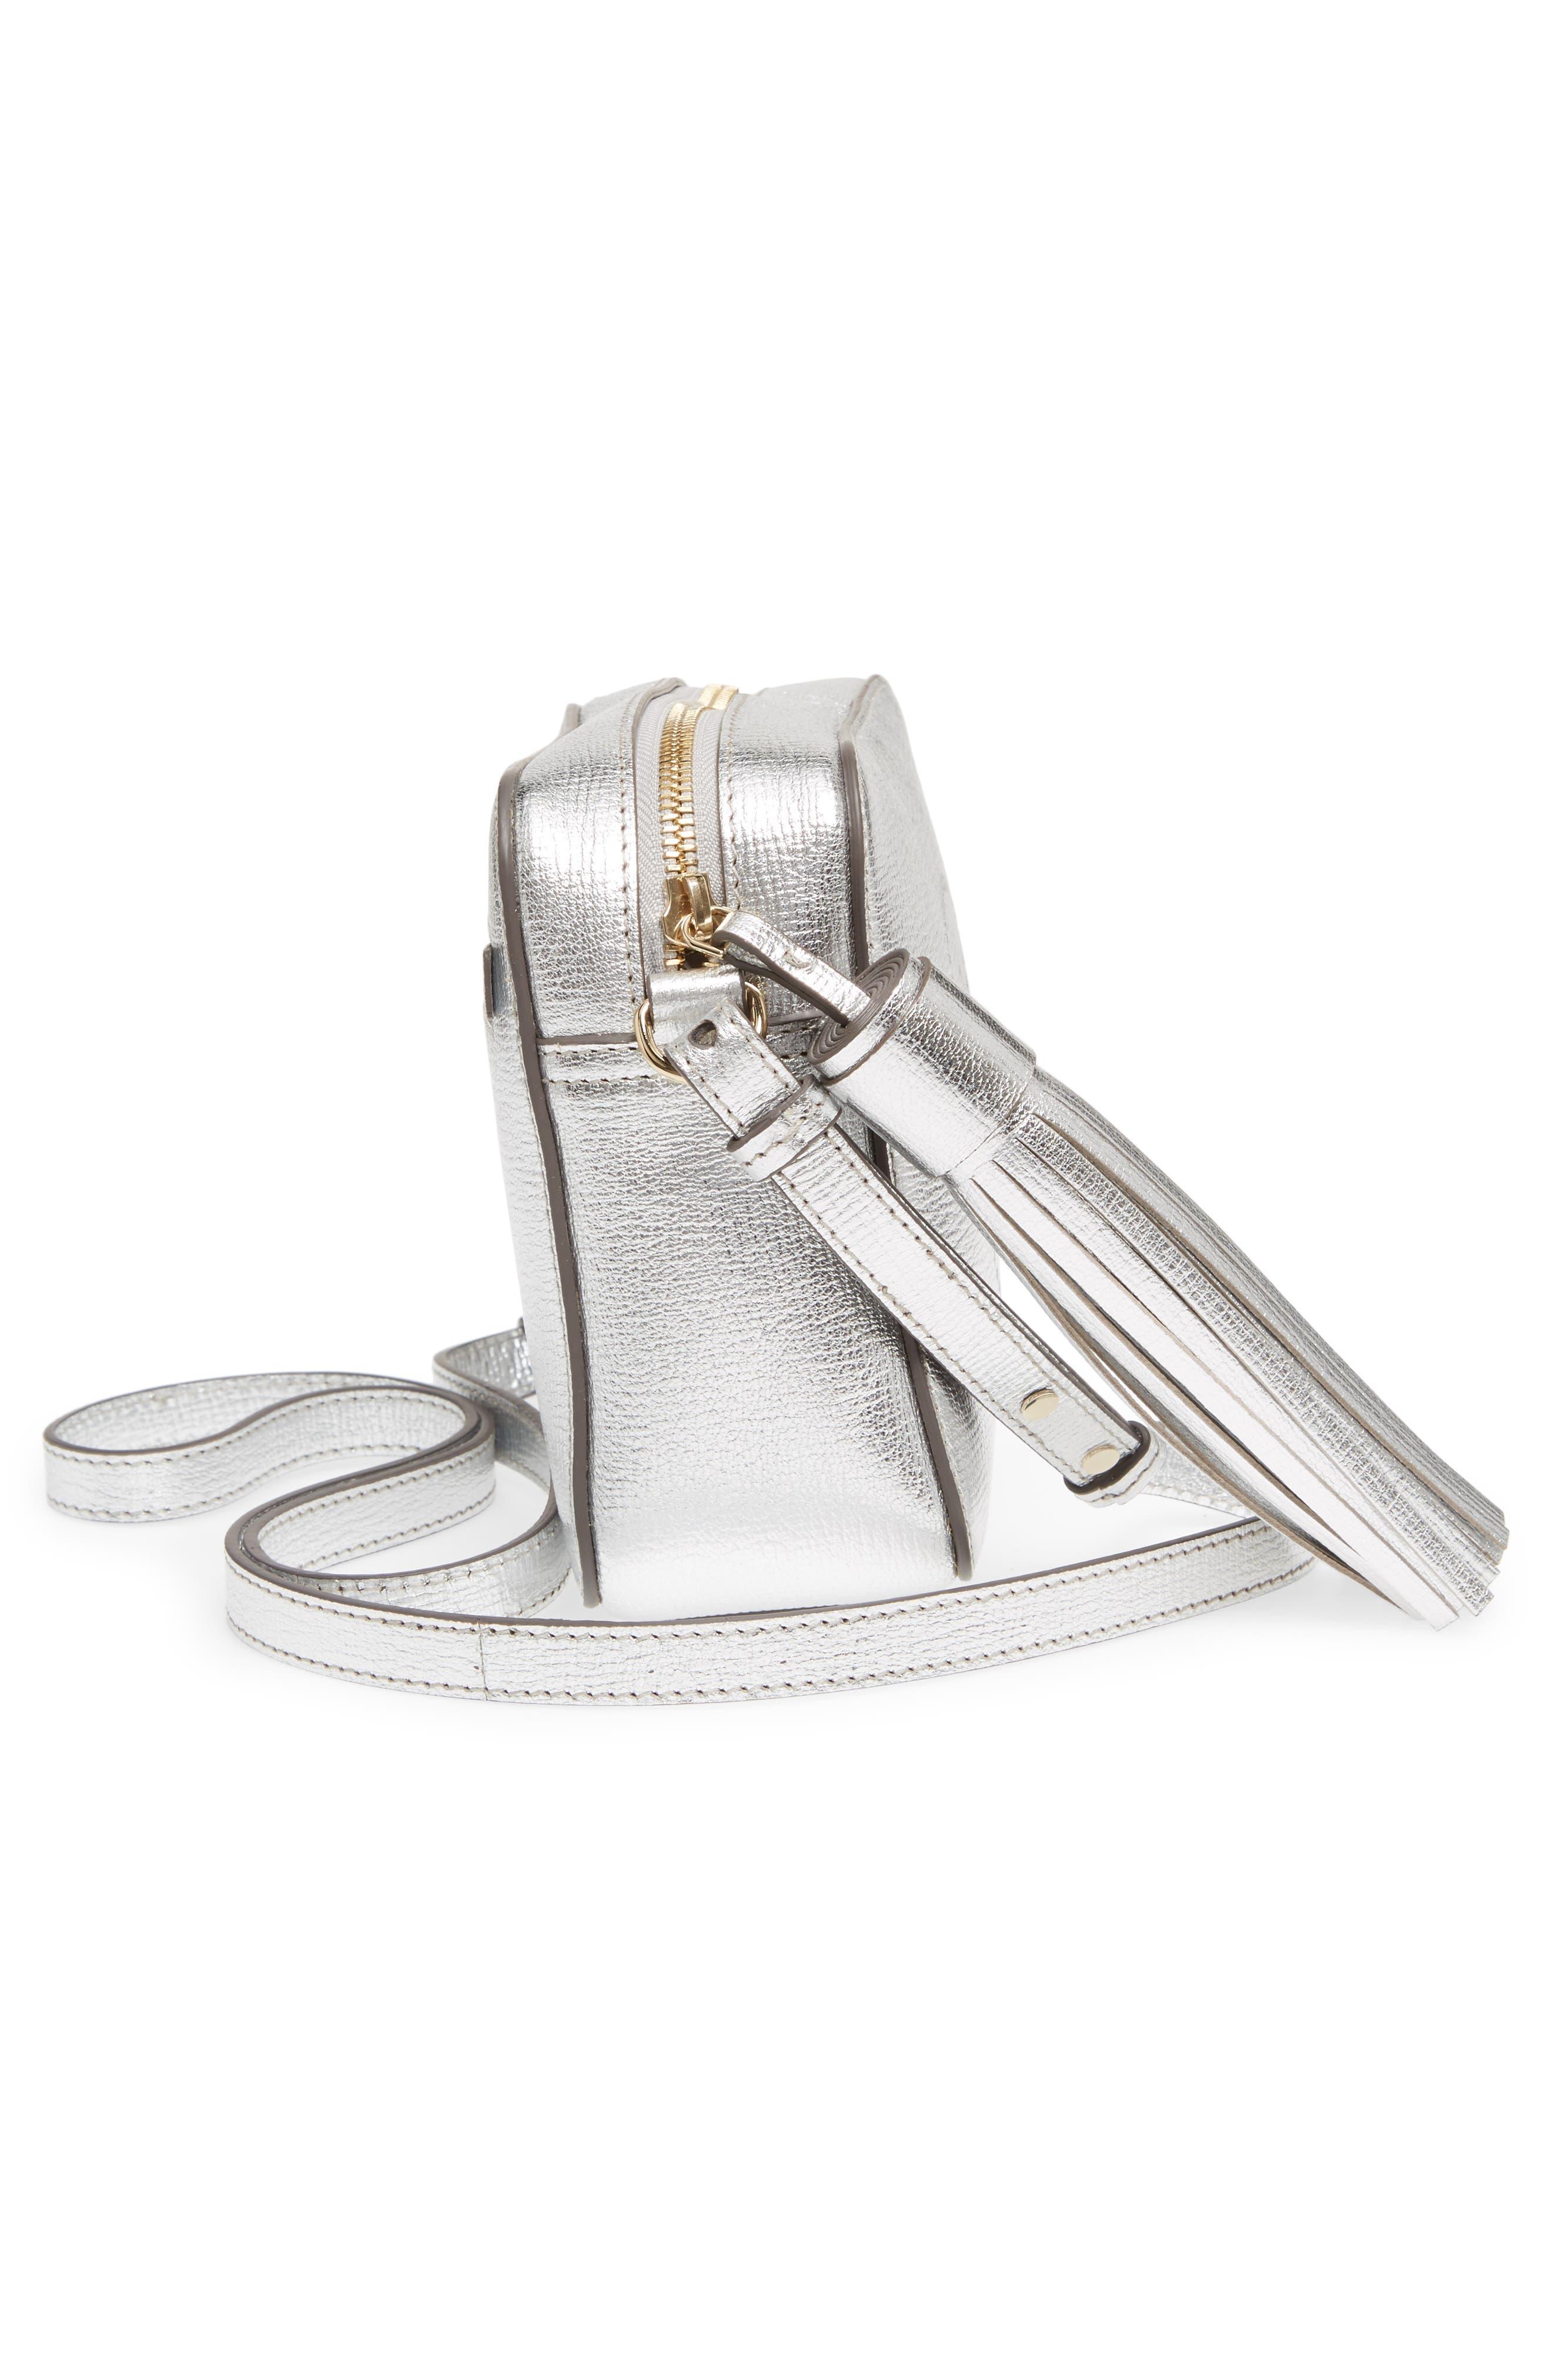 Smiley Metallic Leather Crossbody Bag,                             Alternate thumbnail 5, color,                             040